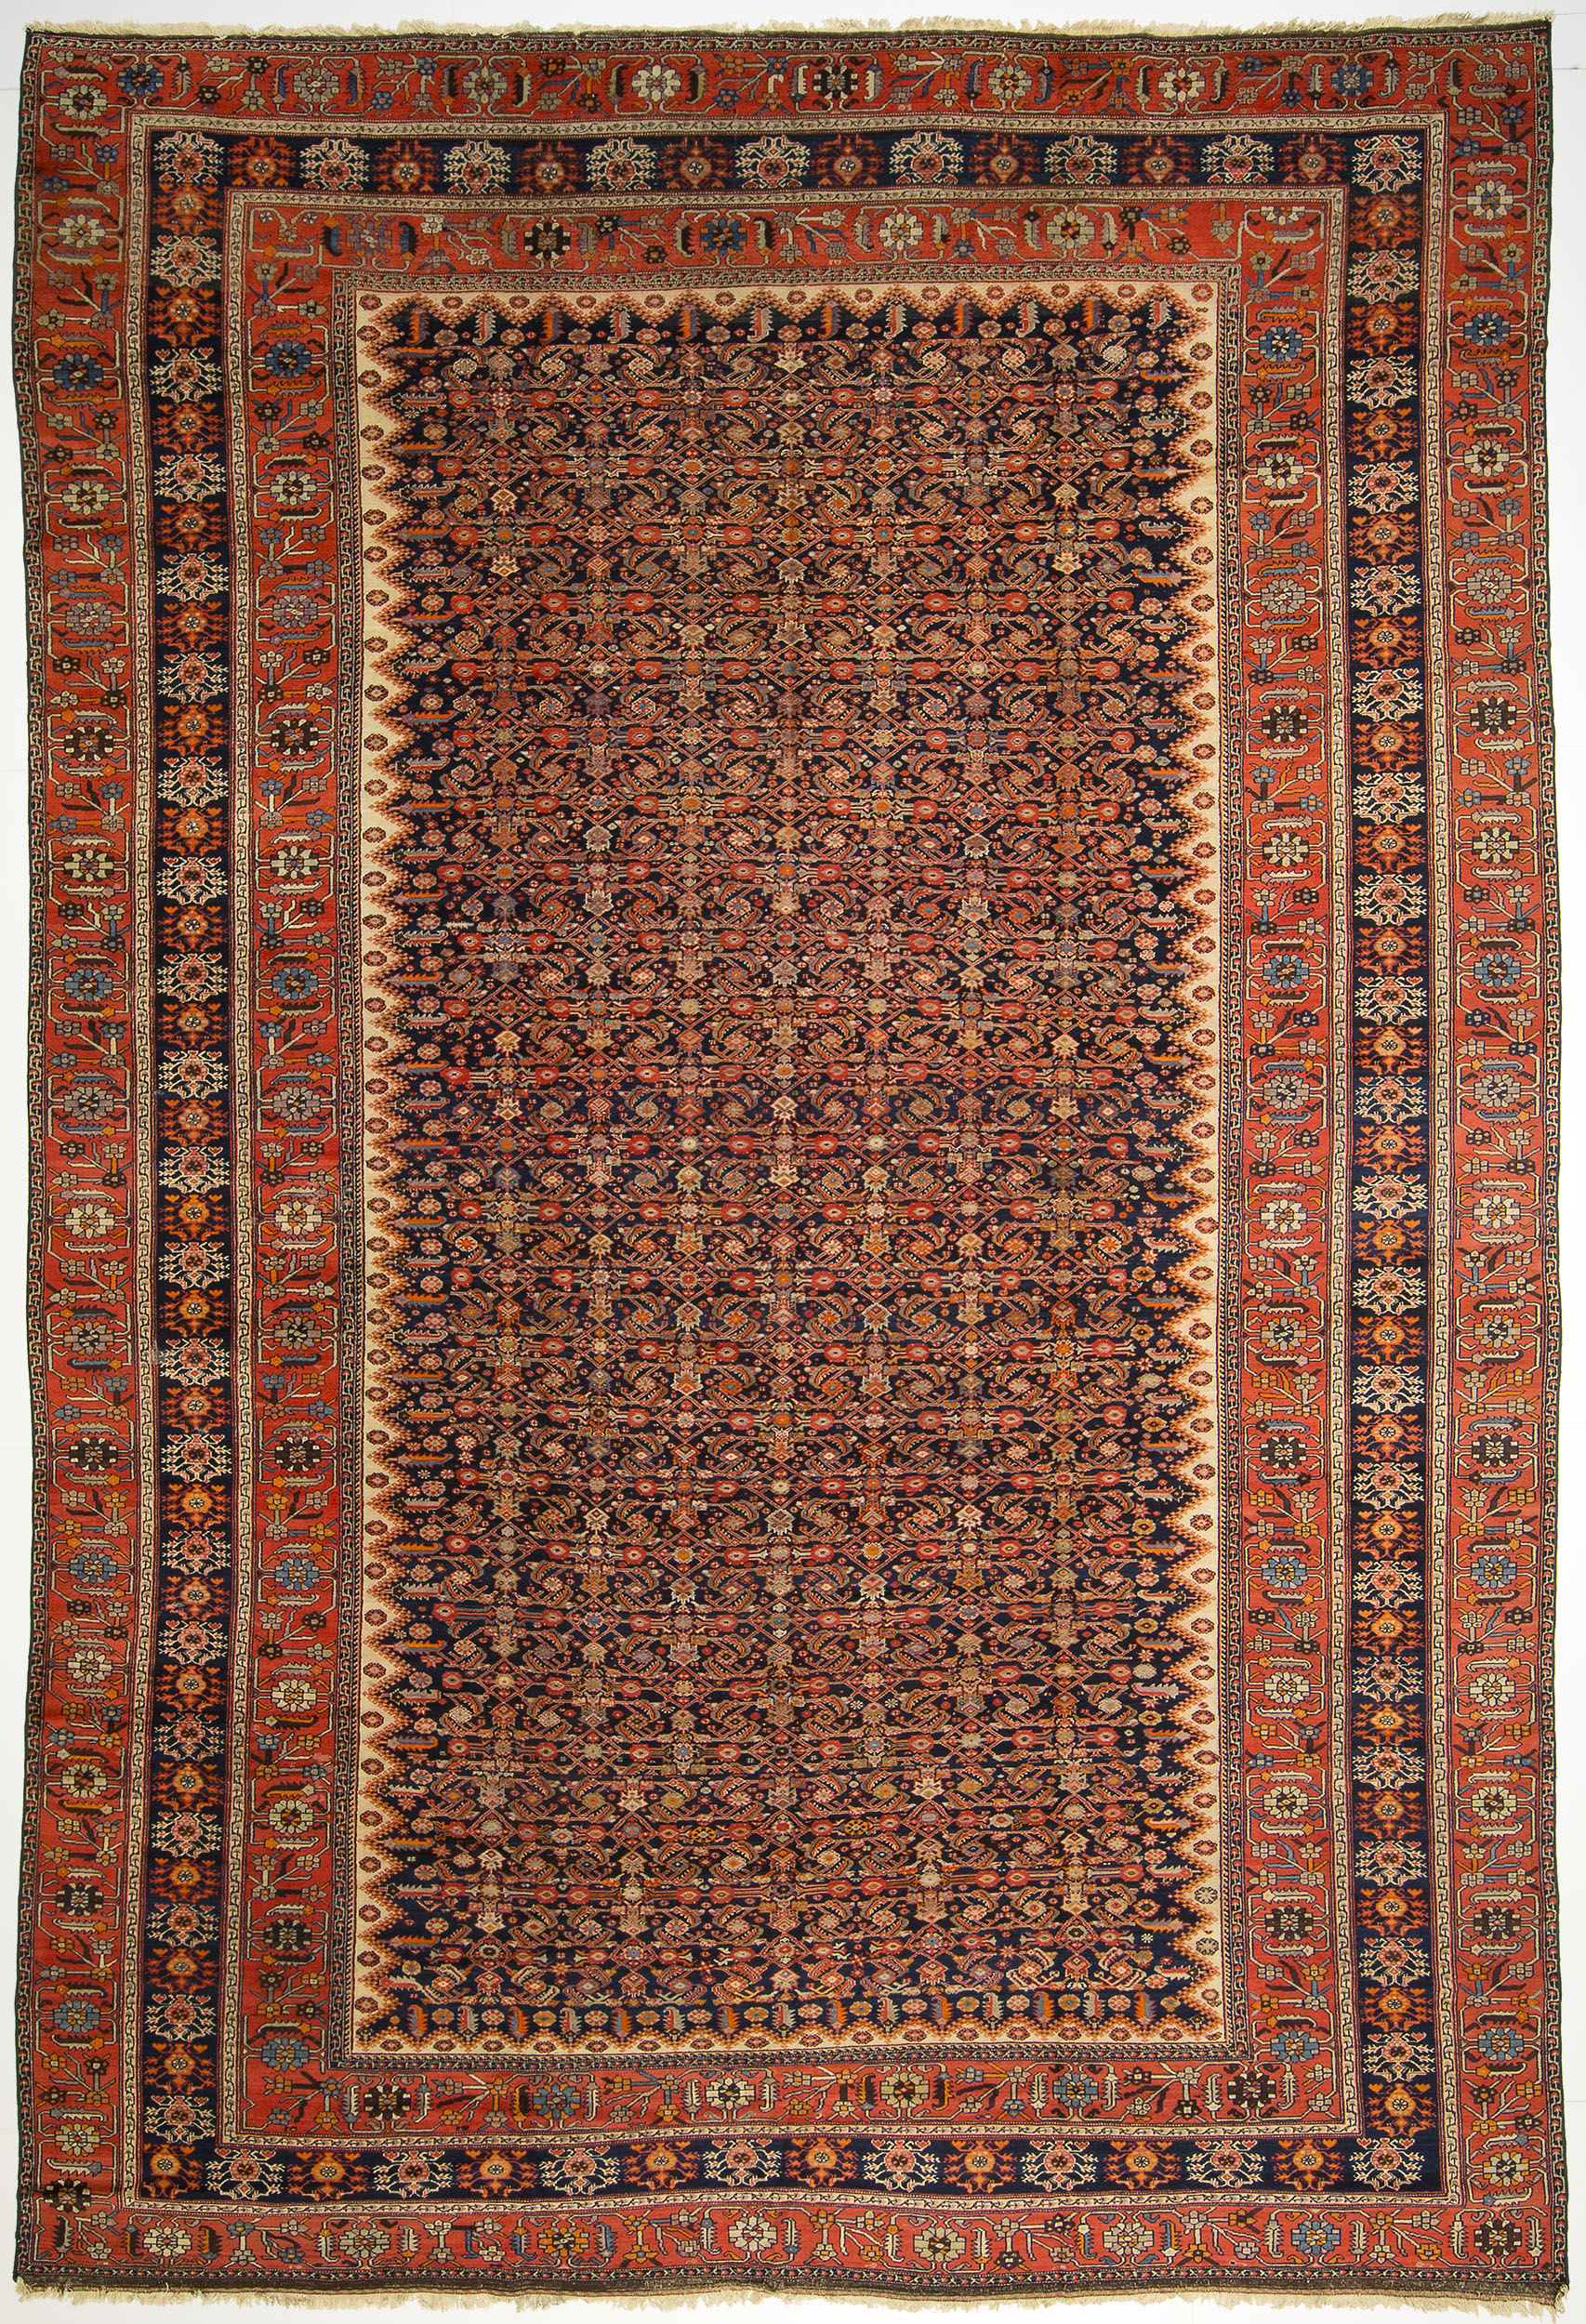 "Malayer Carpet 16' 5"" x 10' 9"""